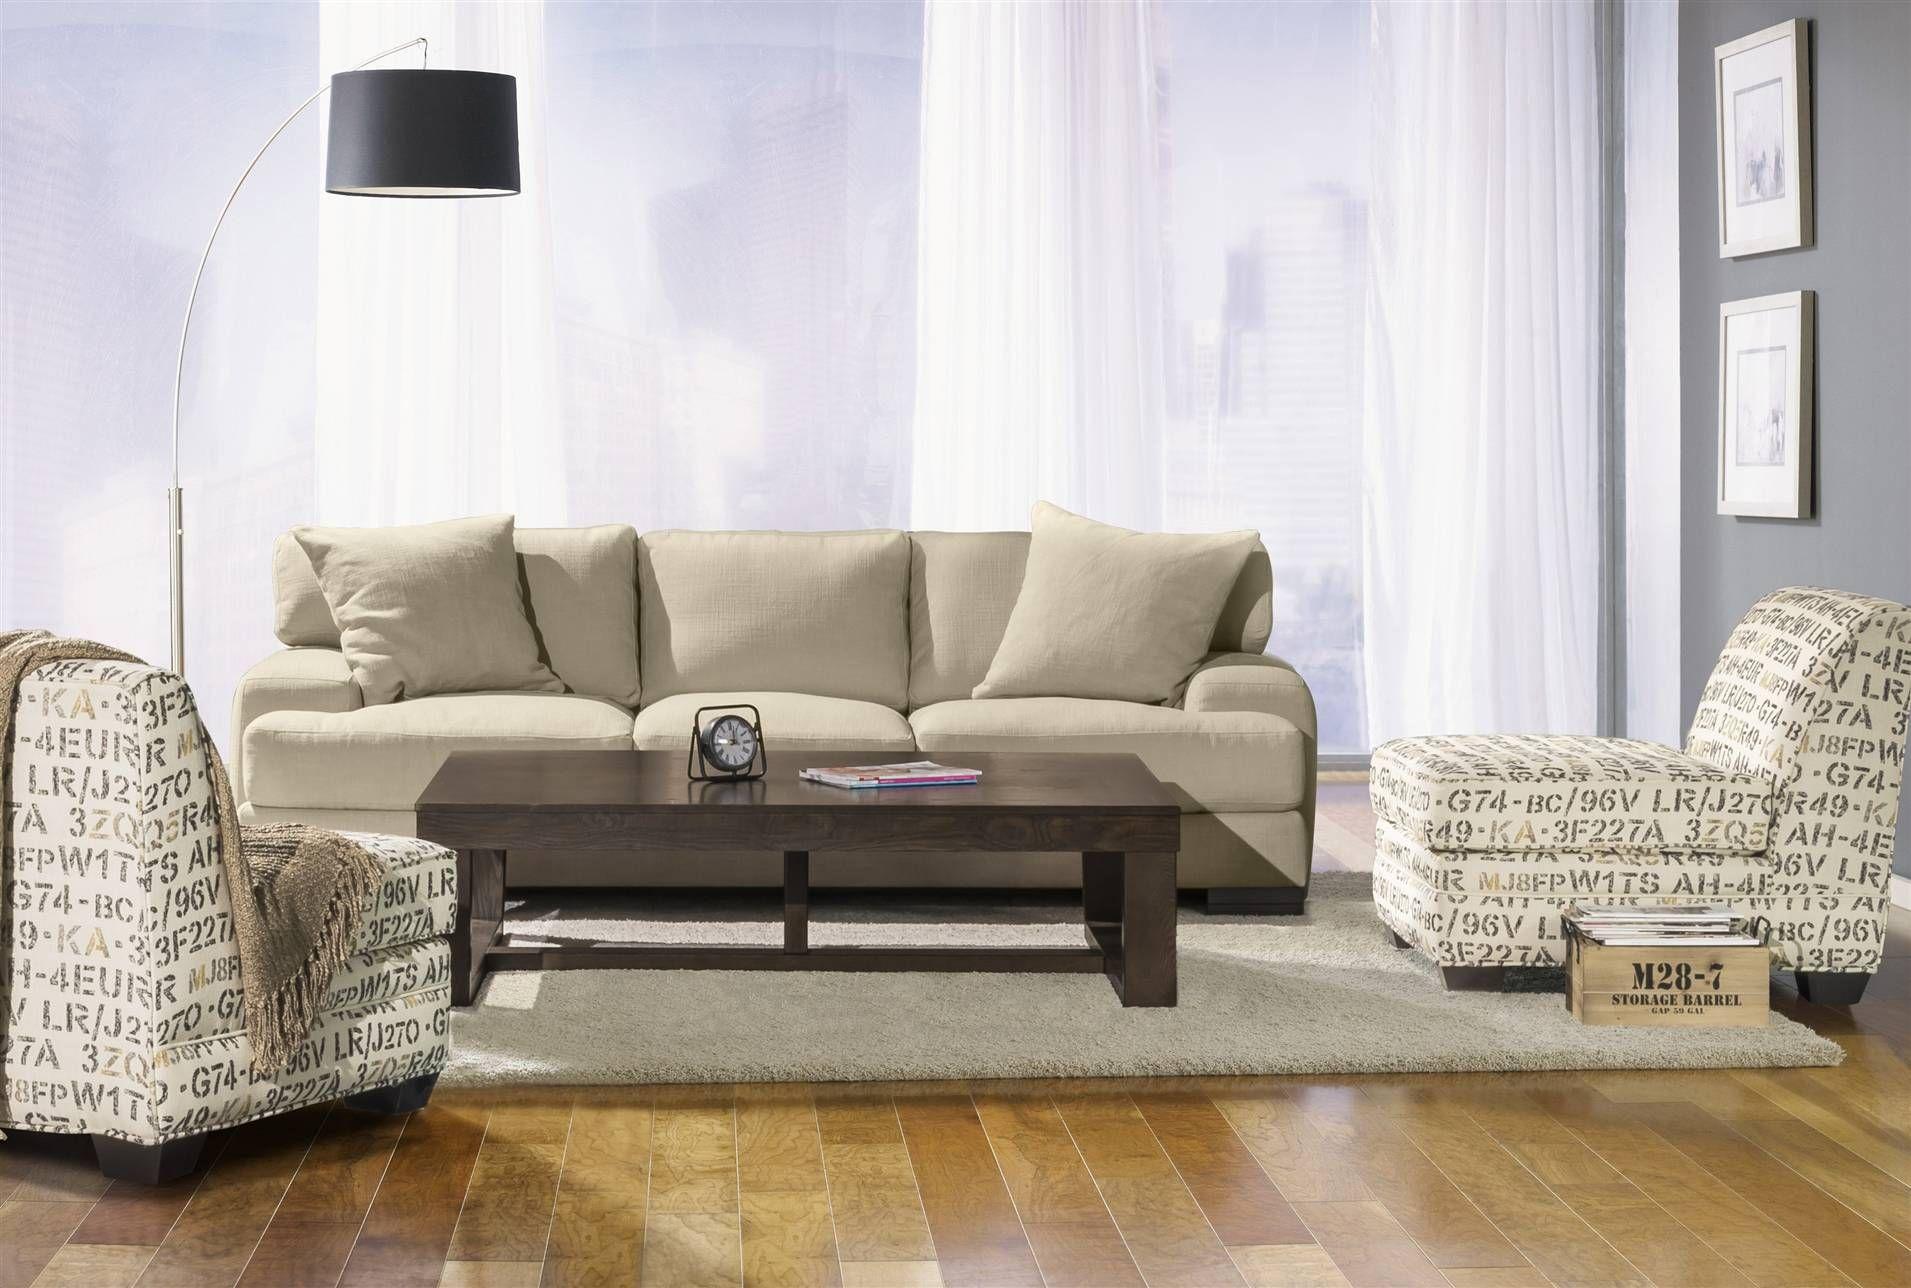 Seabury sofa decorate pinterest decorating